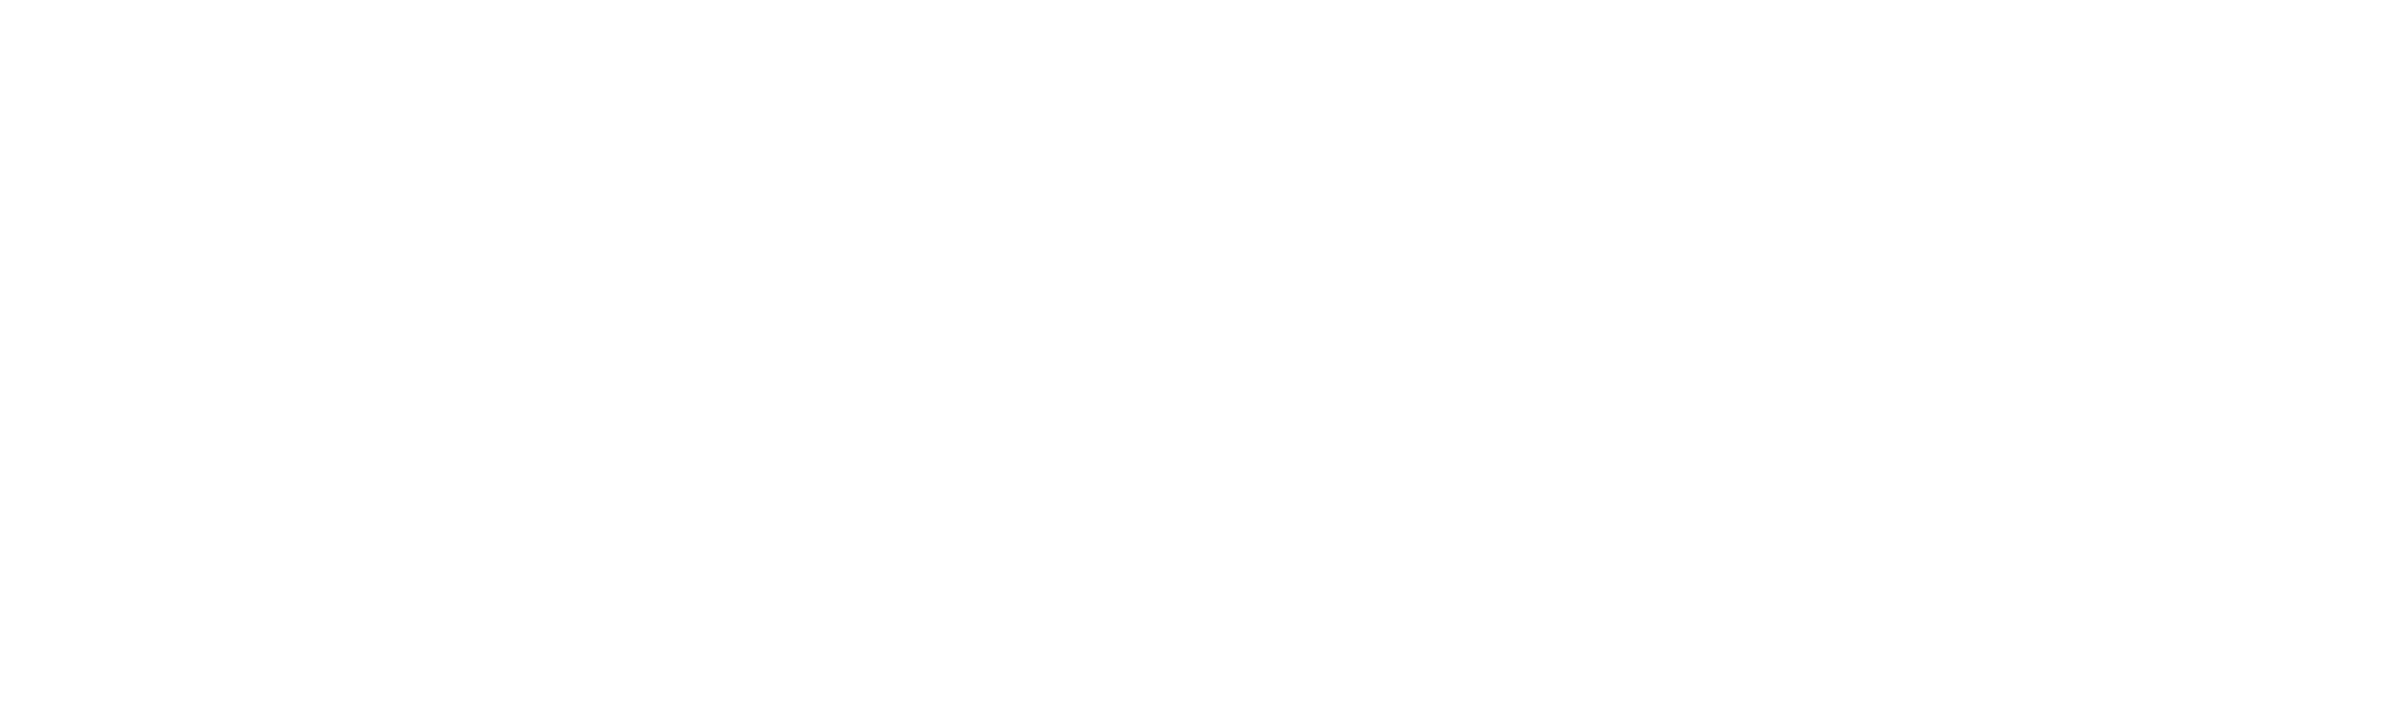 Total Food Network Logo Png Transparent Svg Vector Freebie Supply